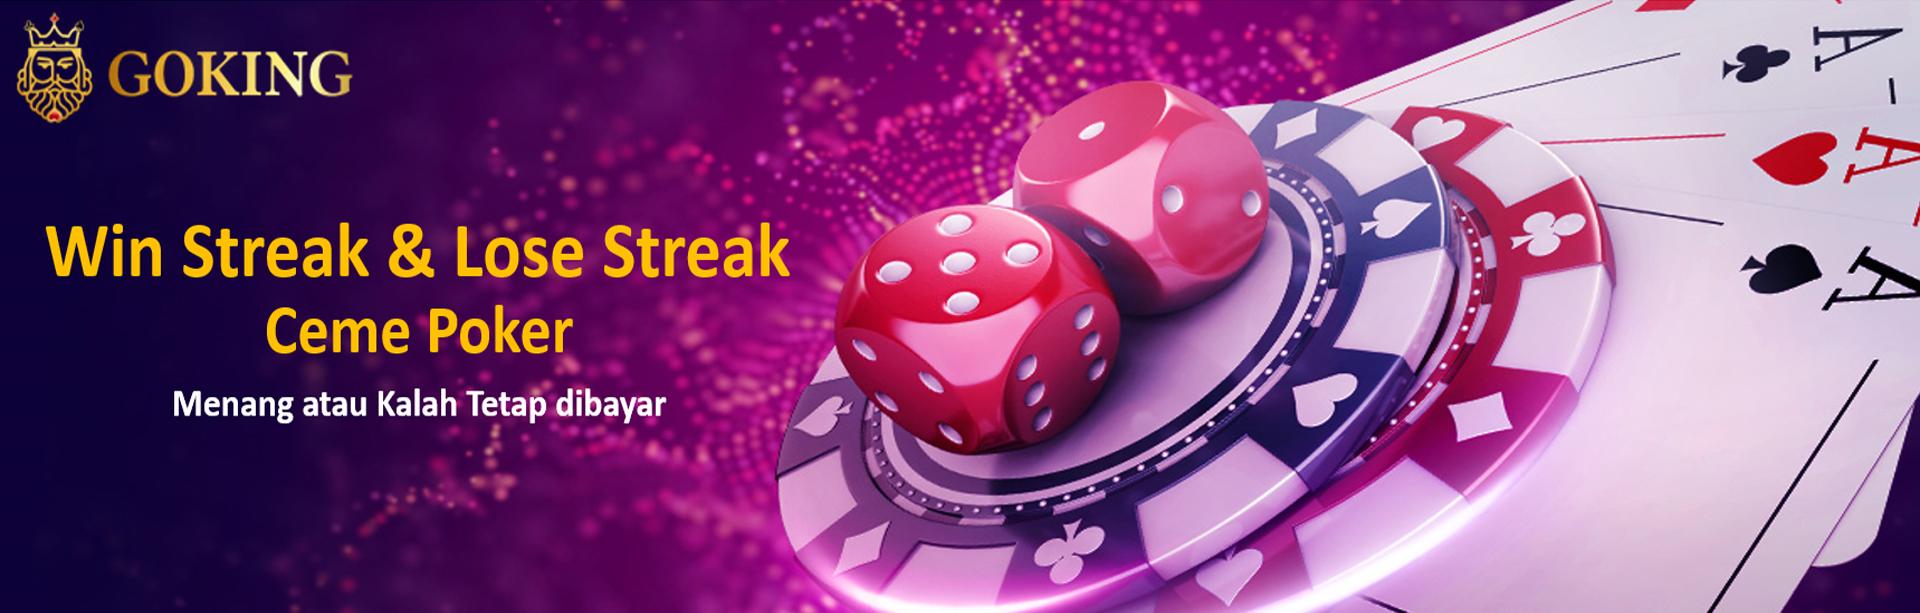 BONUS WINSTREAK & LOSE STREAK CEME POKER